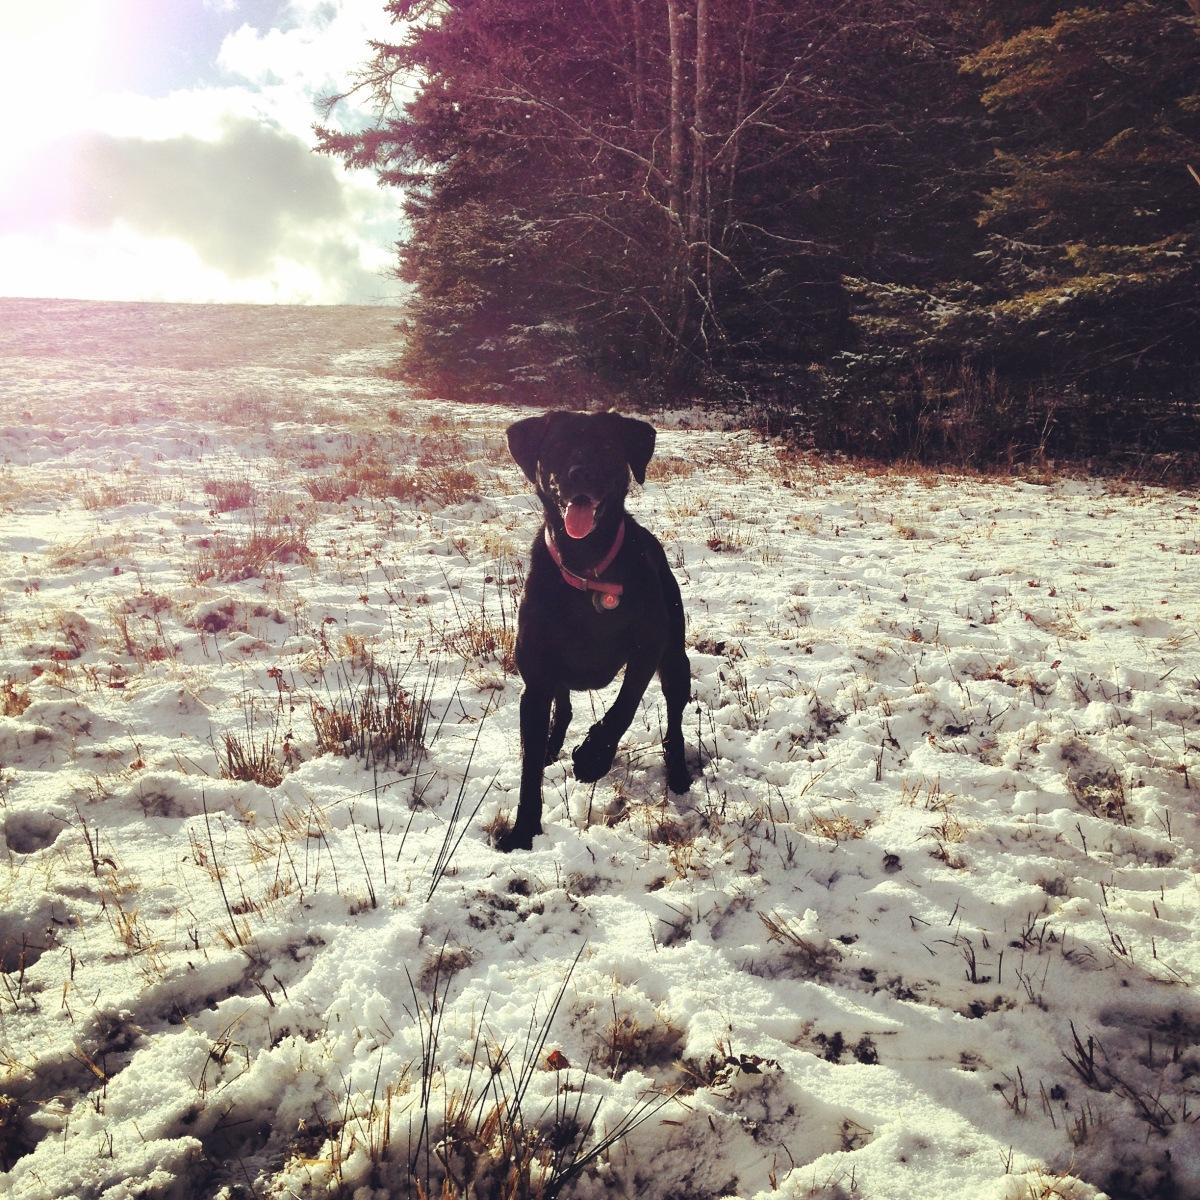 Cole Harbour Lawrencetown Coastal Heritage Park is dog-friendly